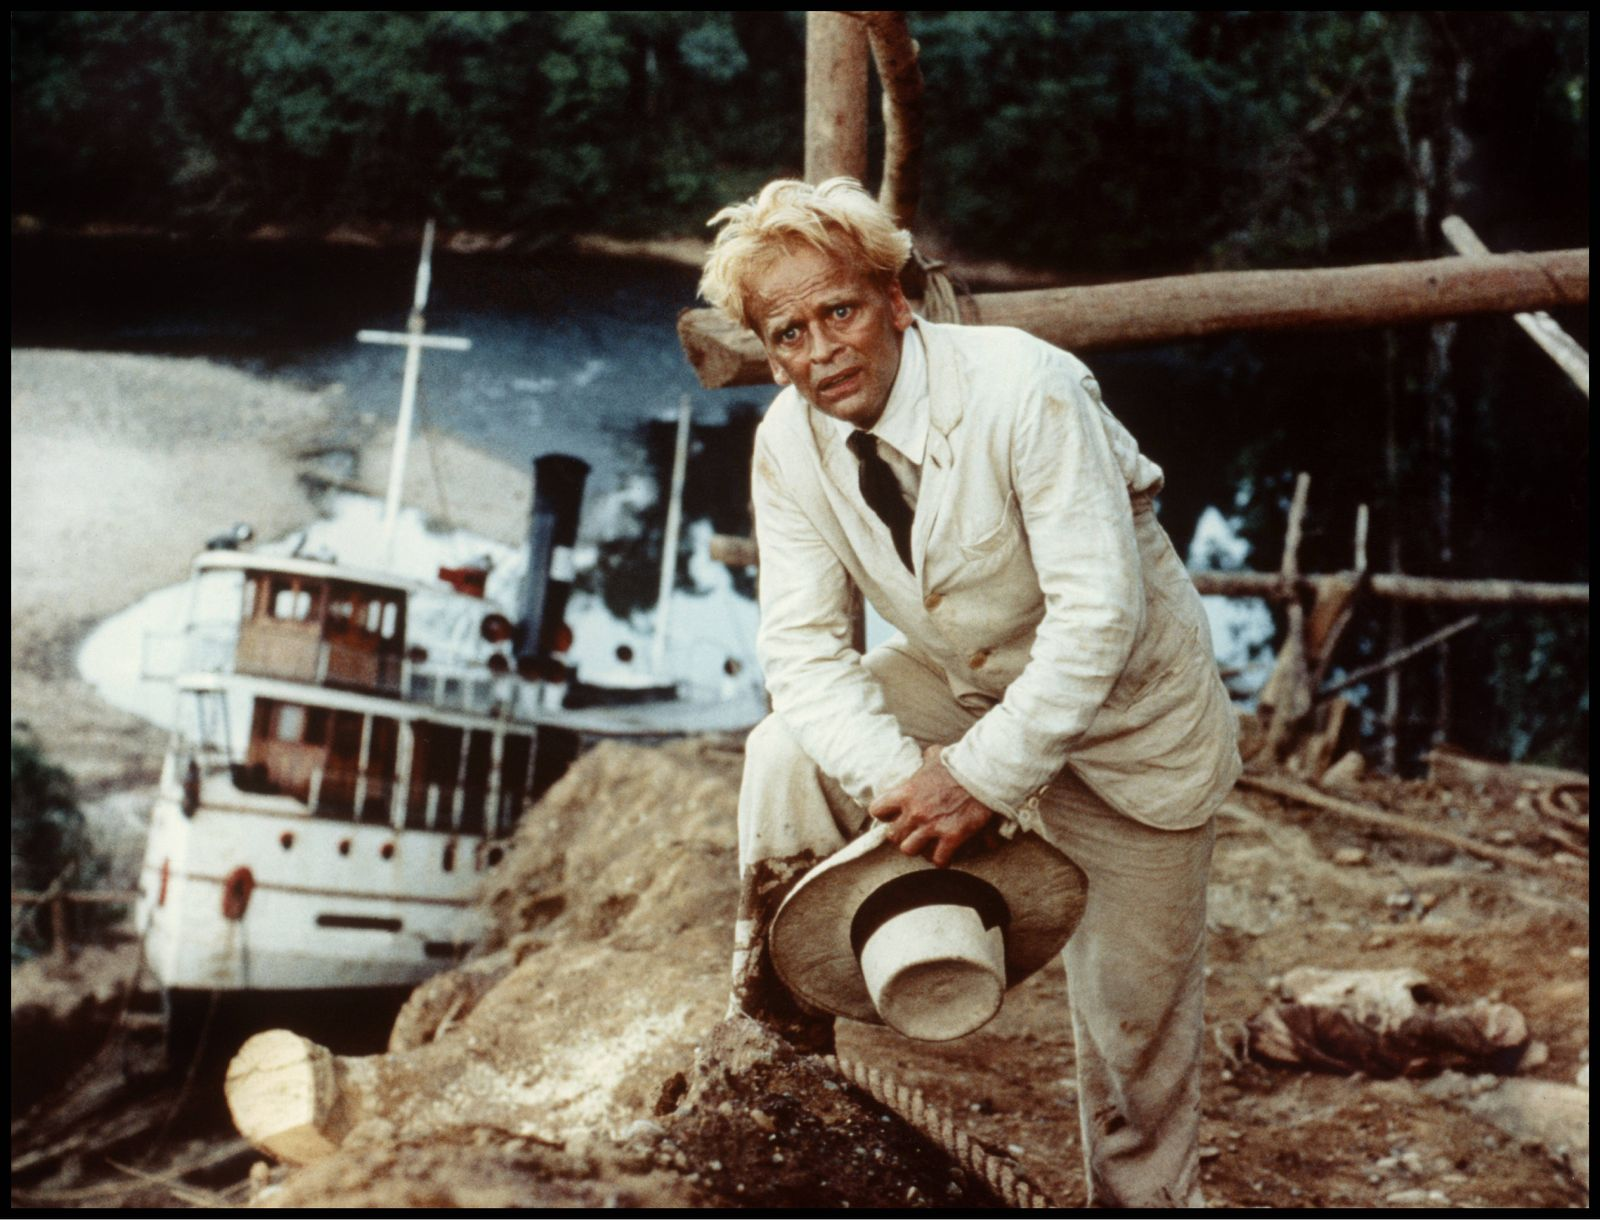 Werner Herzog / Pro-Ject / DR FITZCARRALDO (FITZCARRALDO) de Werner Herzog 1982 ALL avec Klaus Kinski Amazonie, aventur